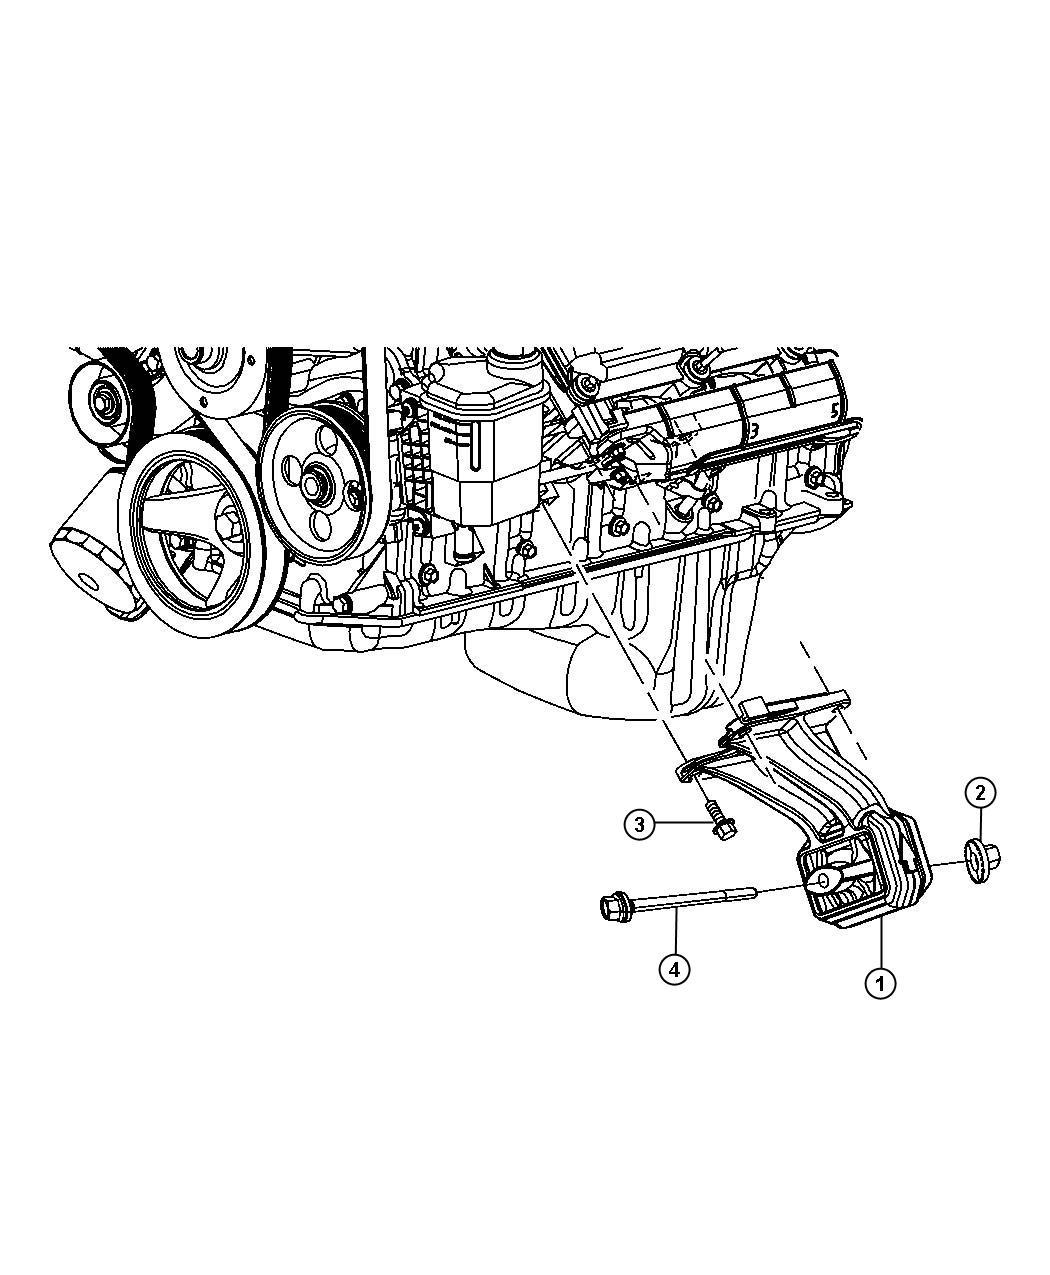 2011 Dodge Ram 1500 Insulator. Engine mount. Left side